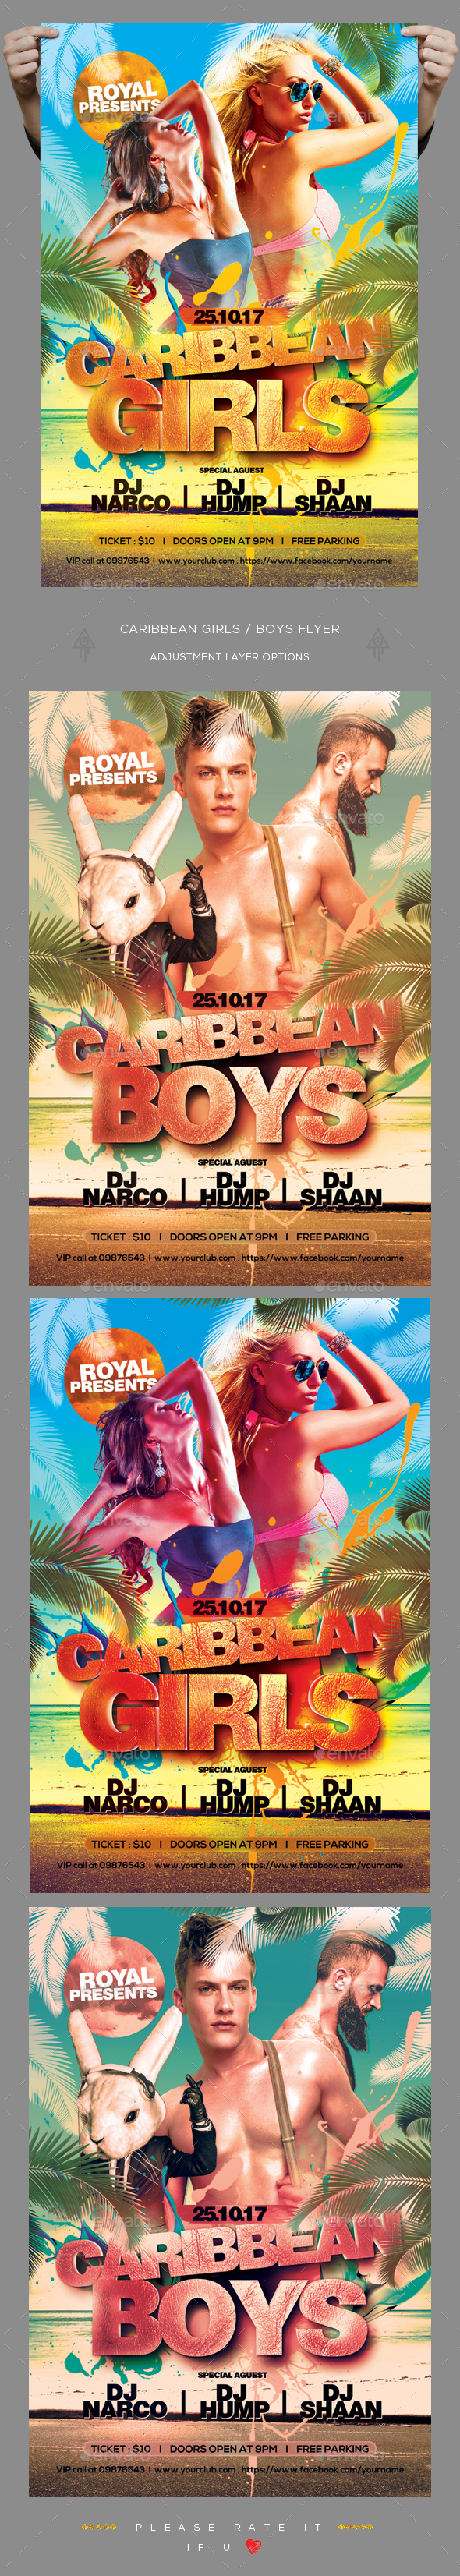 Caribbean Girls / Boys Flyer - Clubs & Parties Events